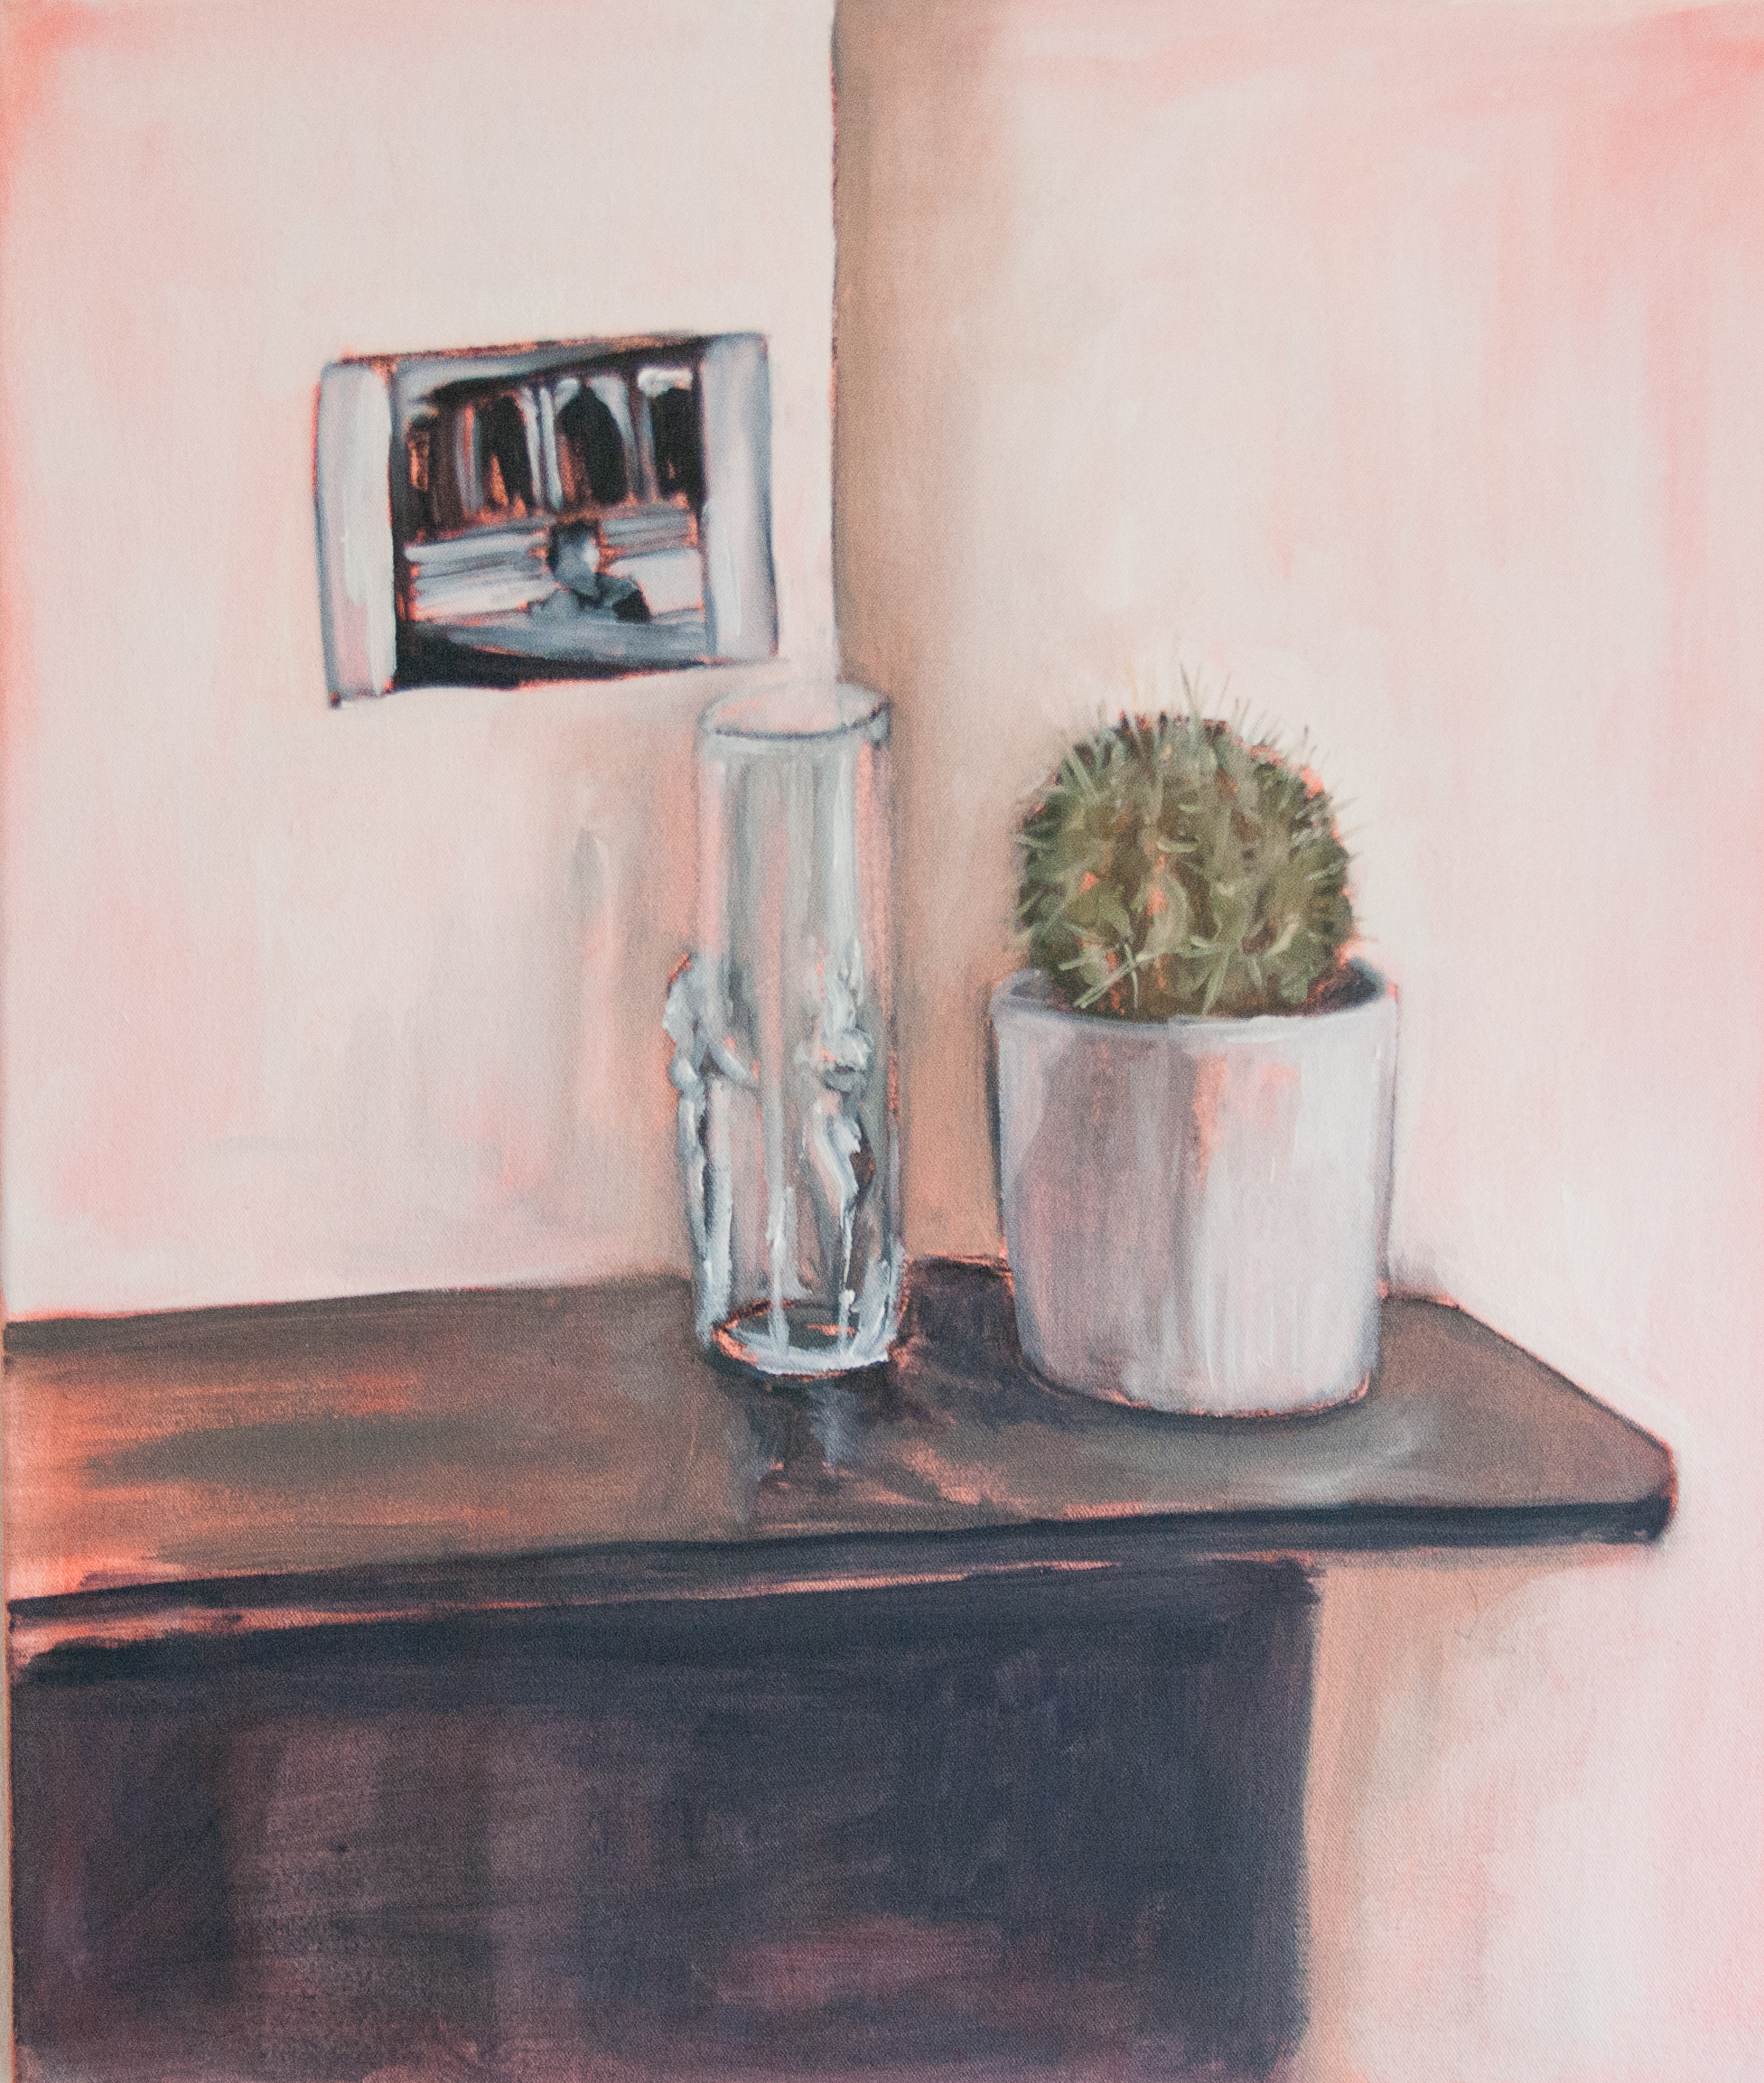 Still Life Day 87. 55x65cm. Oil and acrylic on canvas. 2015.